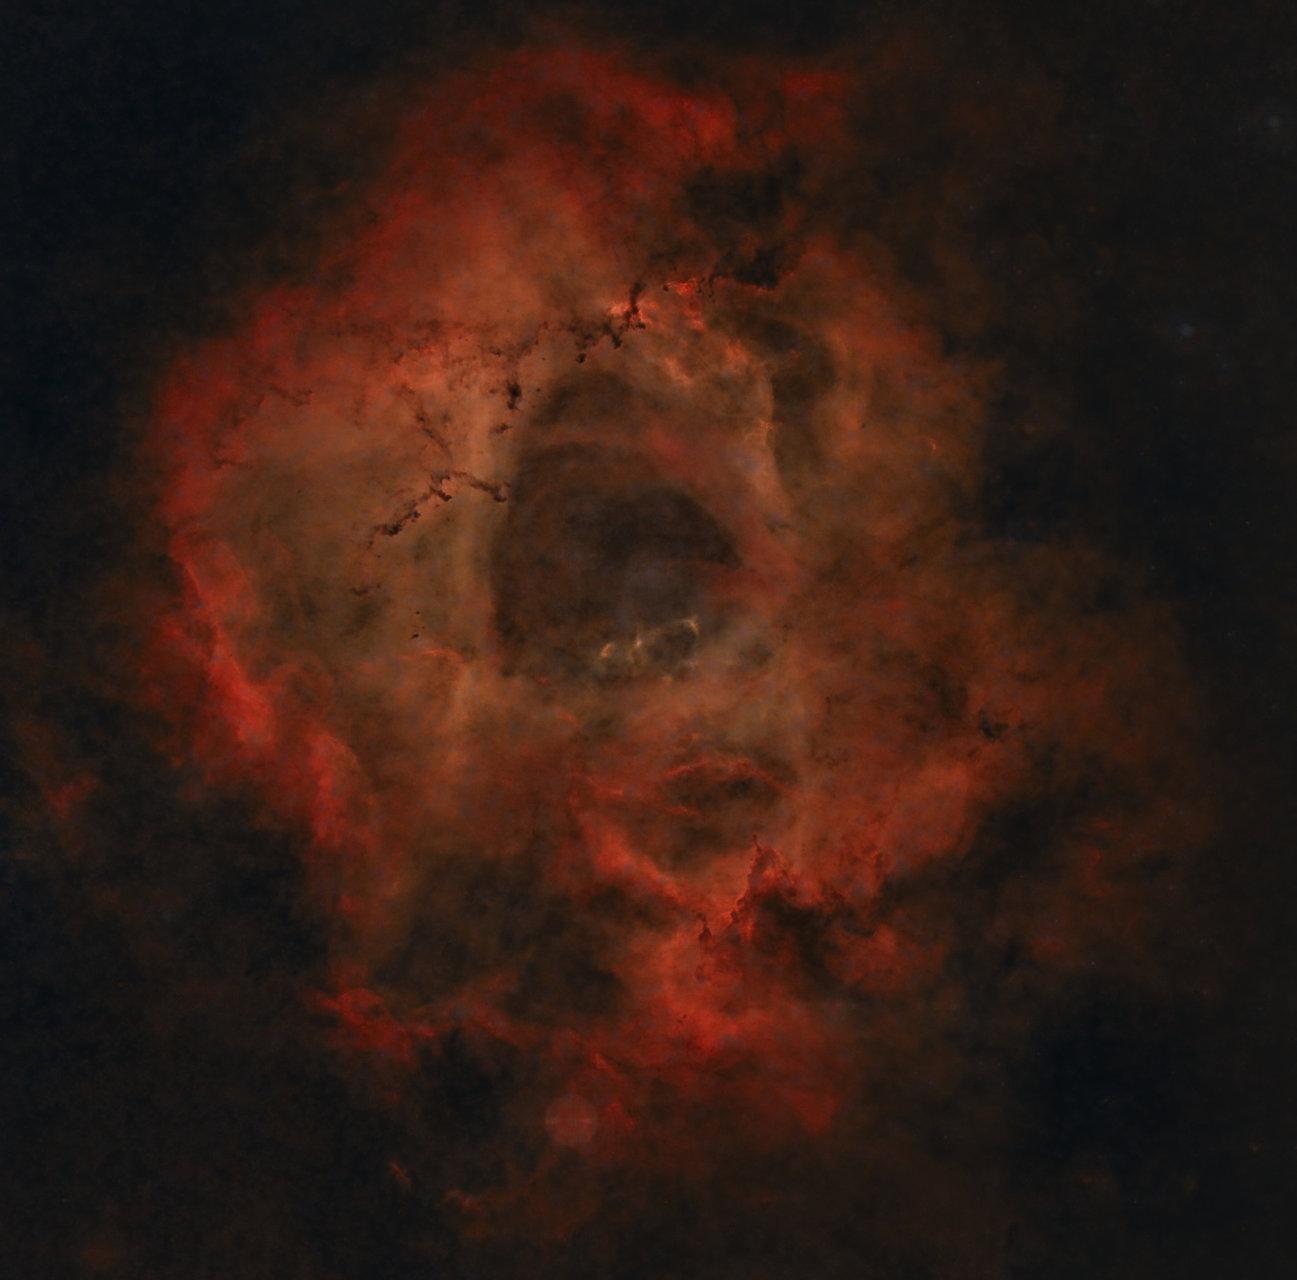 Rosette Starless | Author Ivan Raichev - sektor | PHOTO FORUM